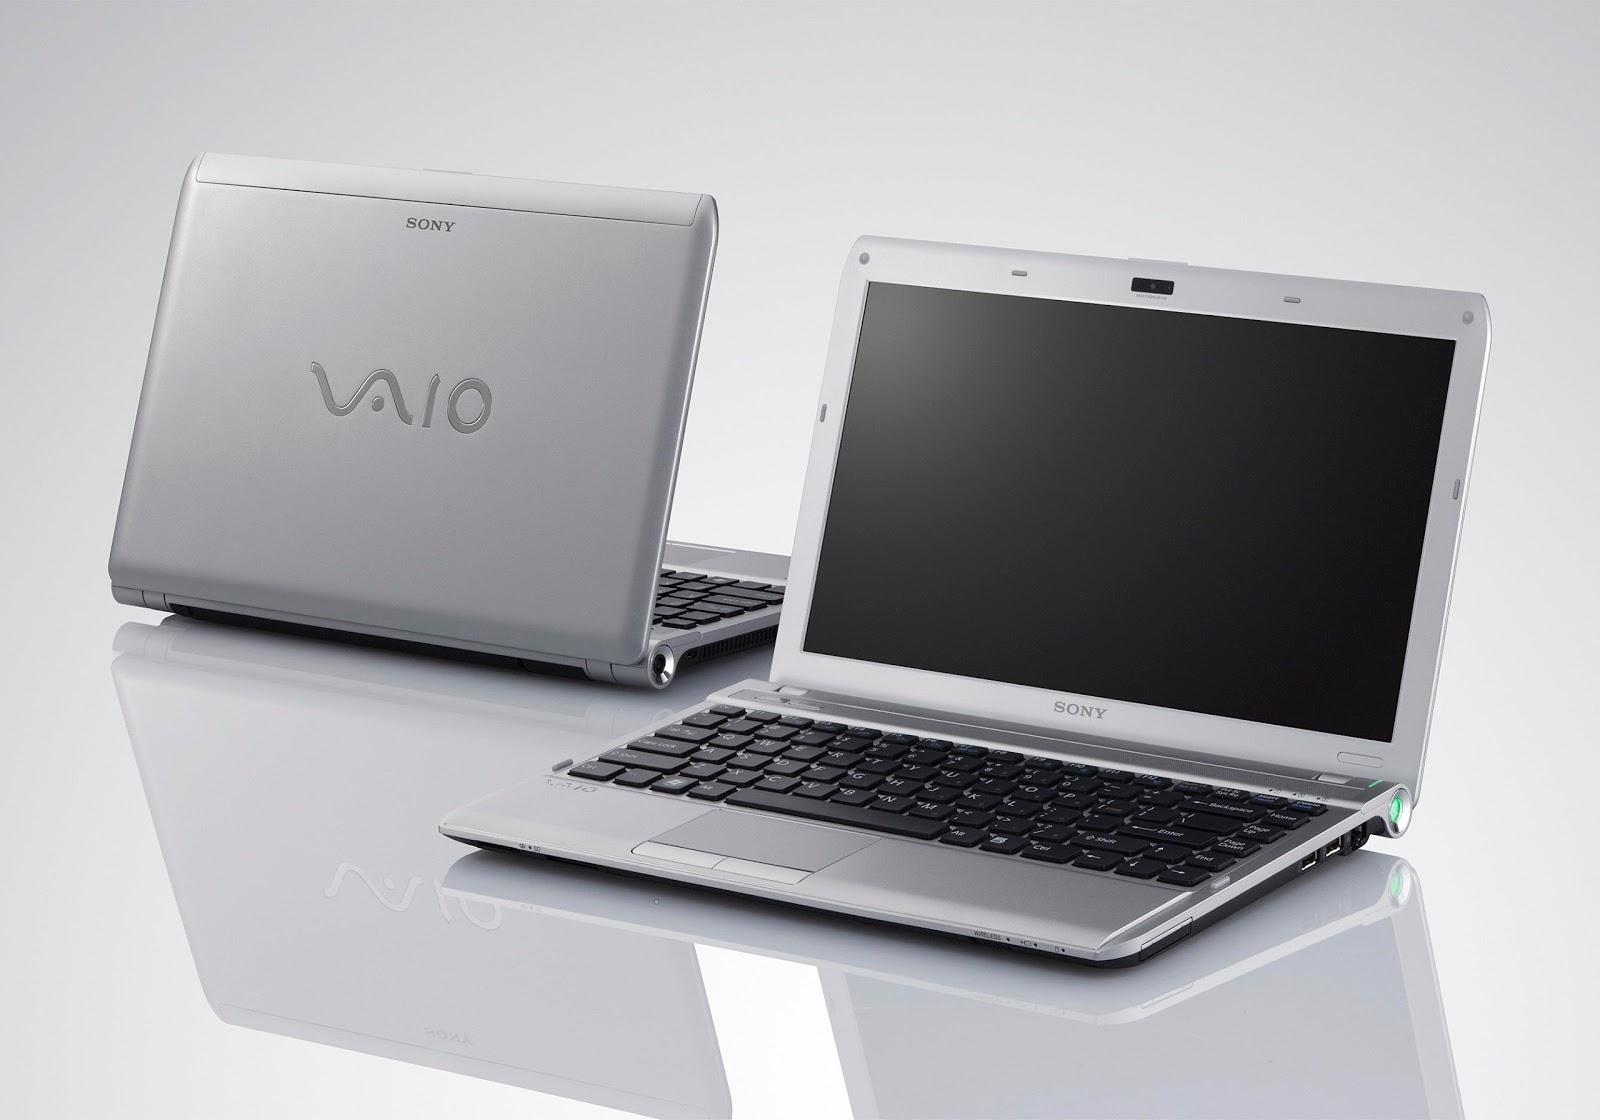 Computer Technologies: Sony Vaio S Series Laptops